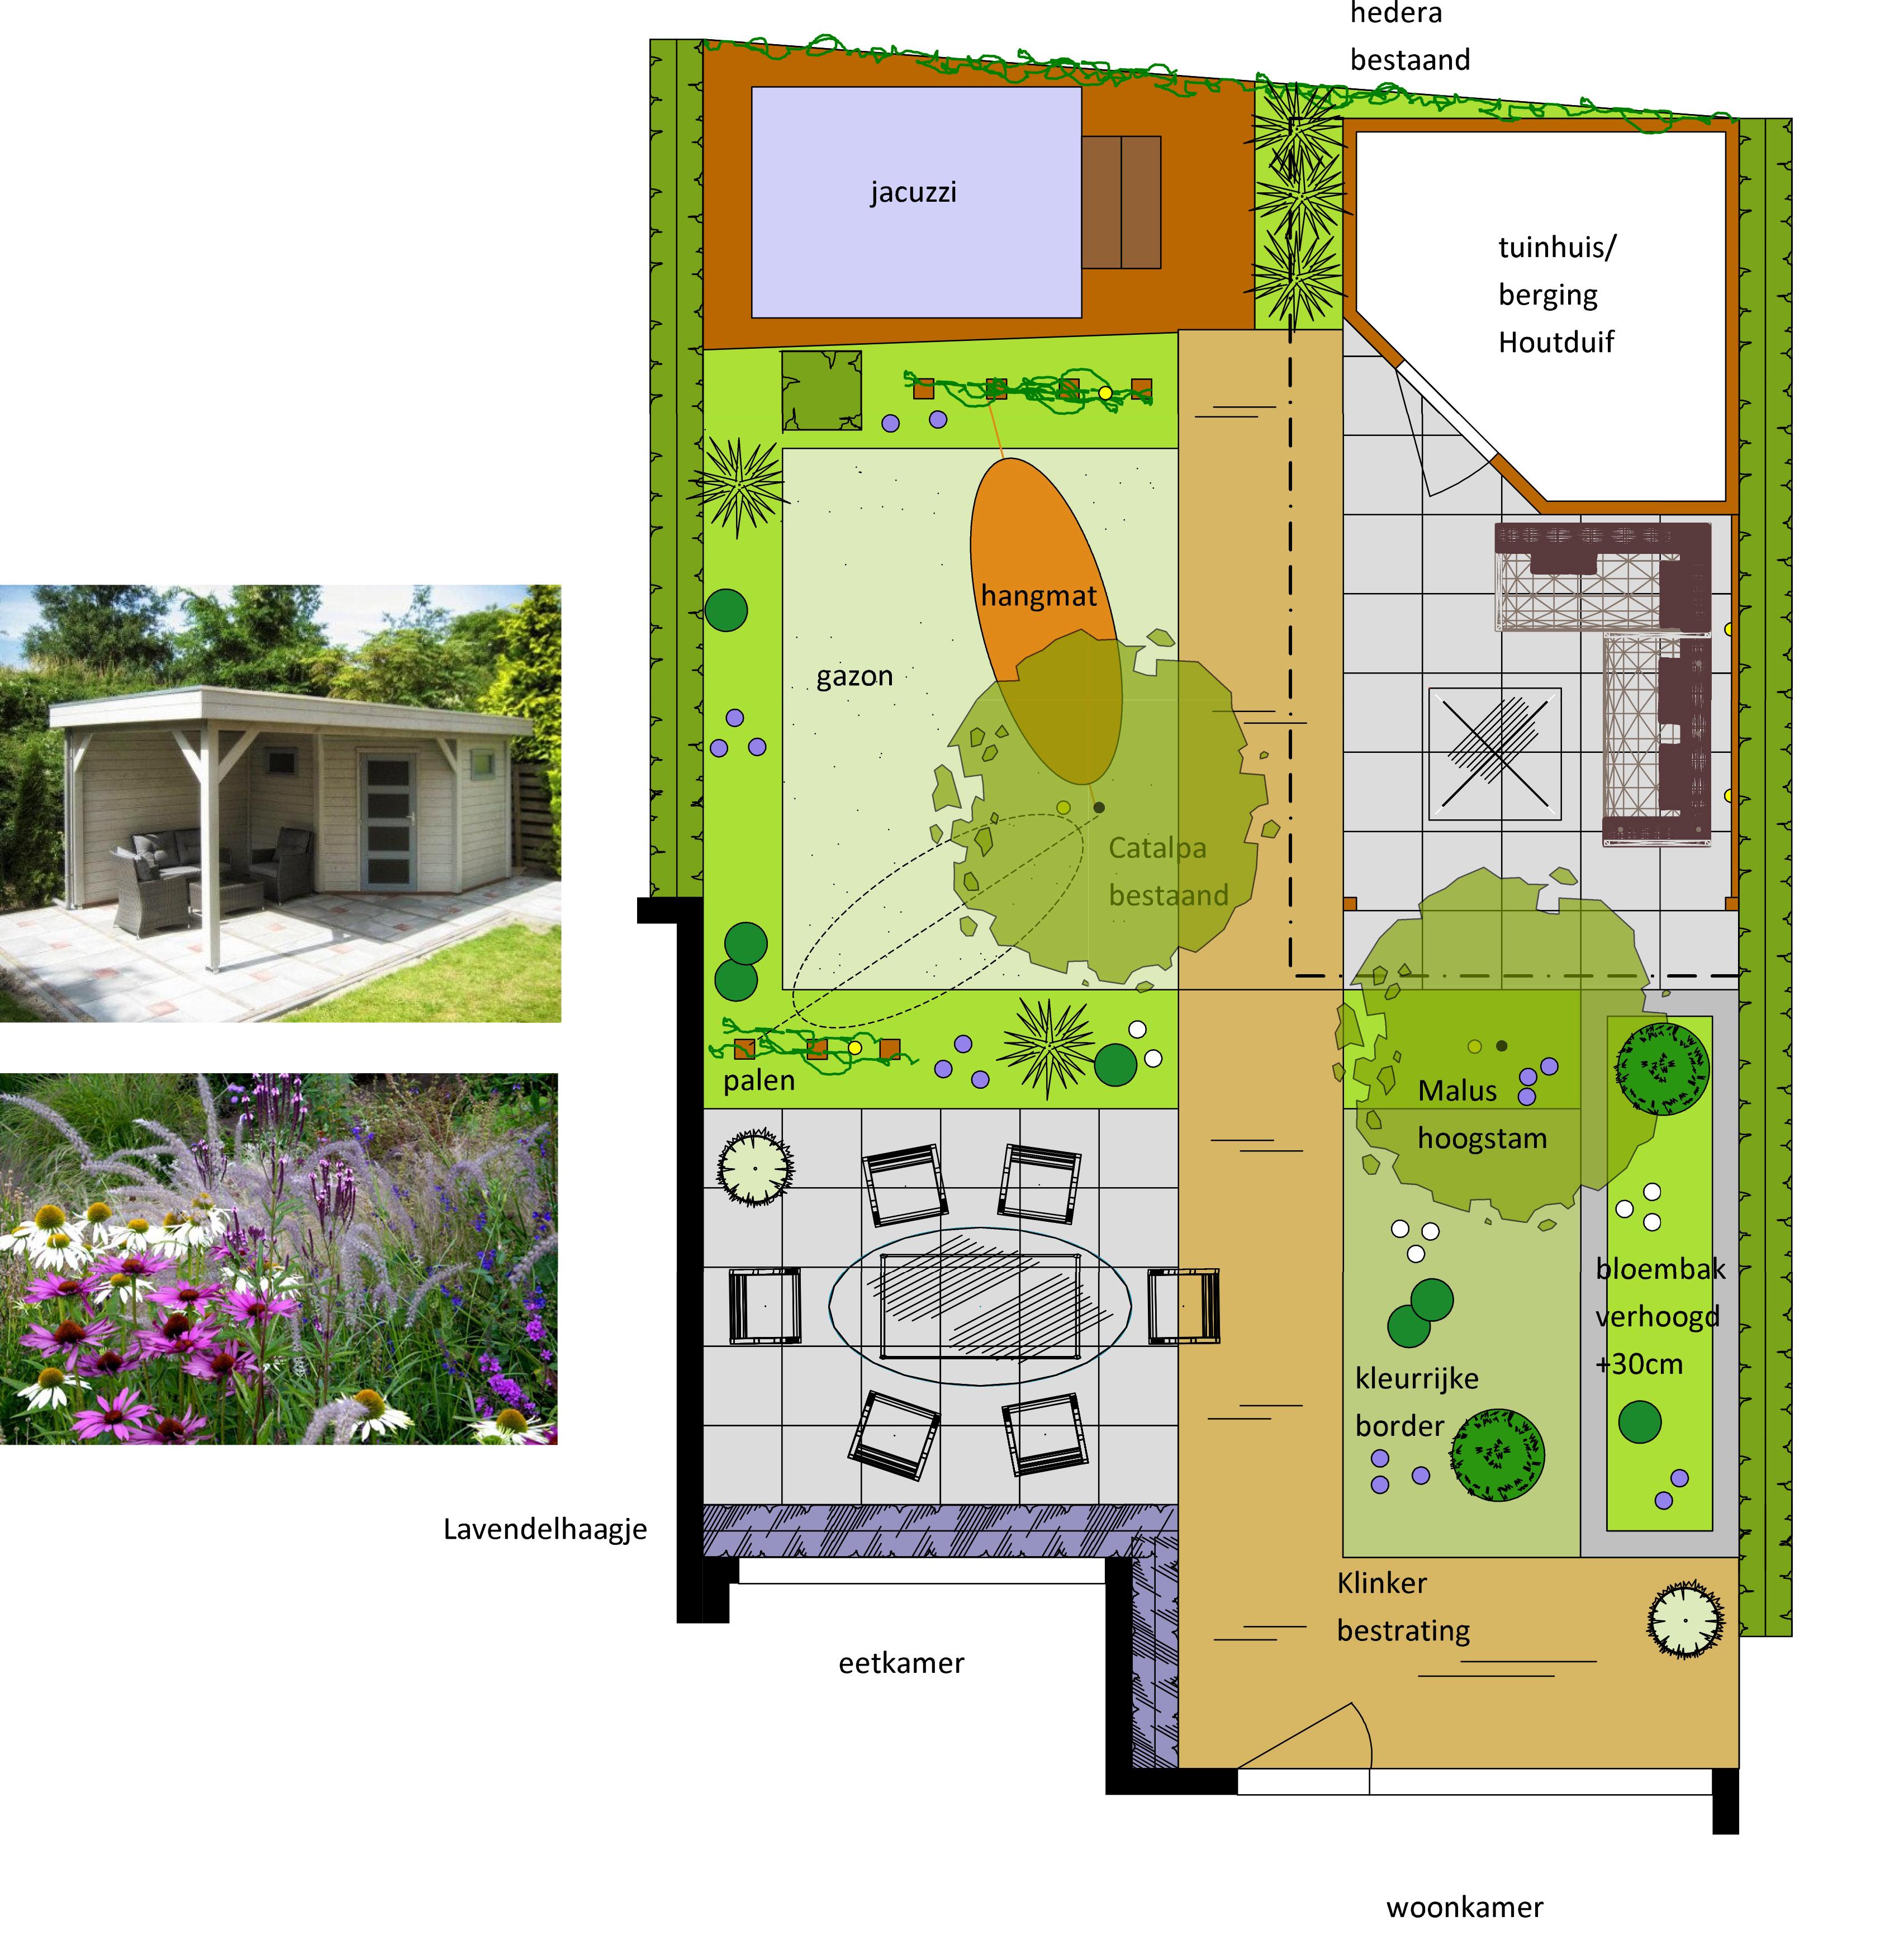 G:\_Projecten\S\Schoenbergen, Arnhem\2019 Schoenbergen, Arnhem\tekeningen\Schoenbergen, ontwerp tuin 19-01-18.hcd